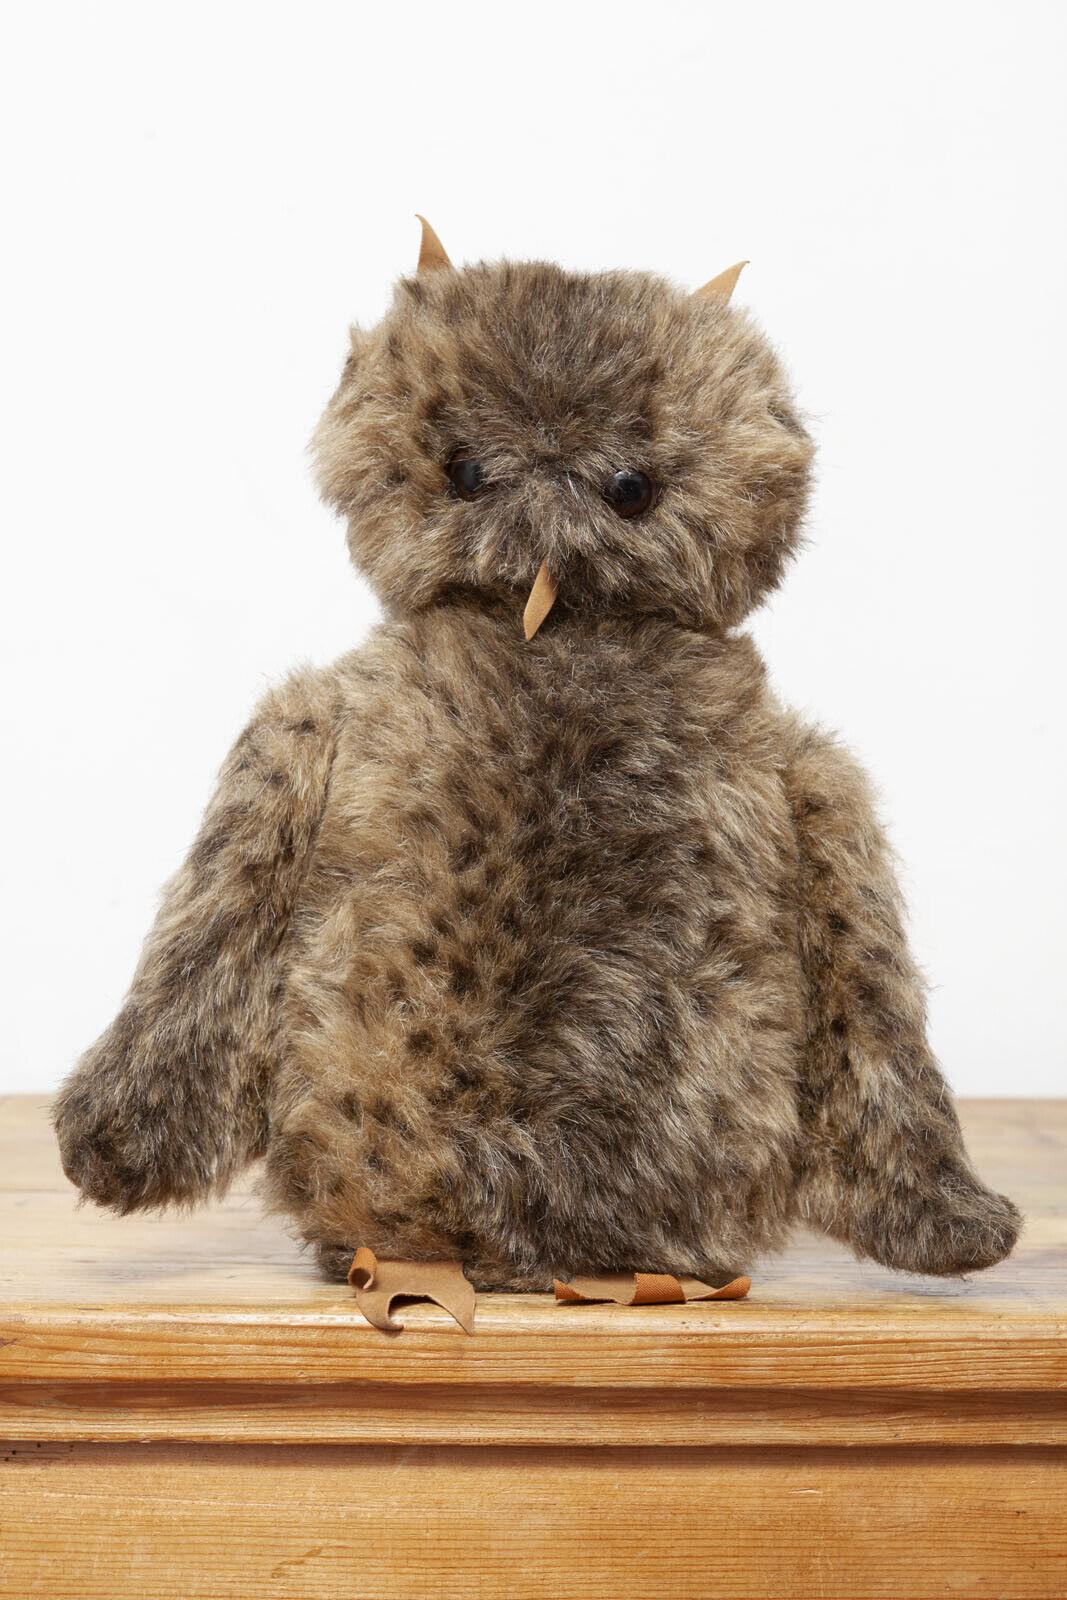 Alresford Craft Ltd Speckled Owl